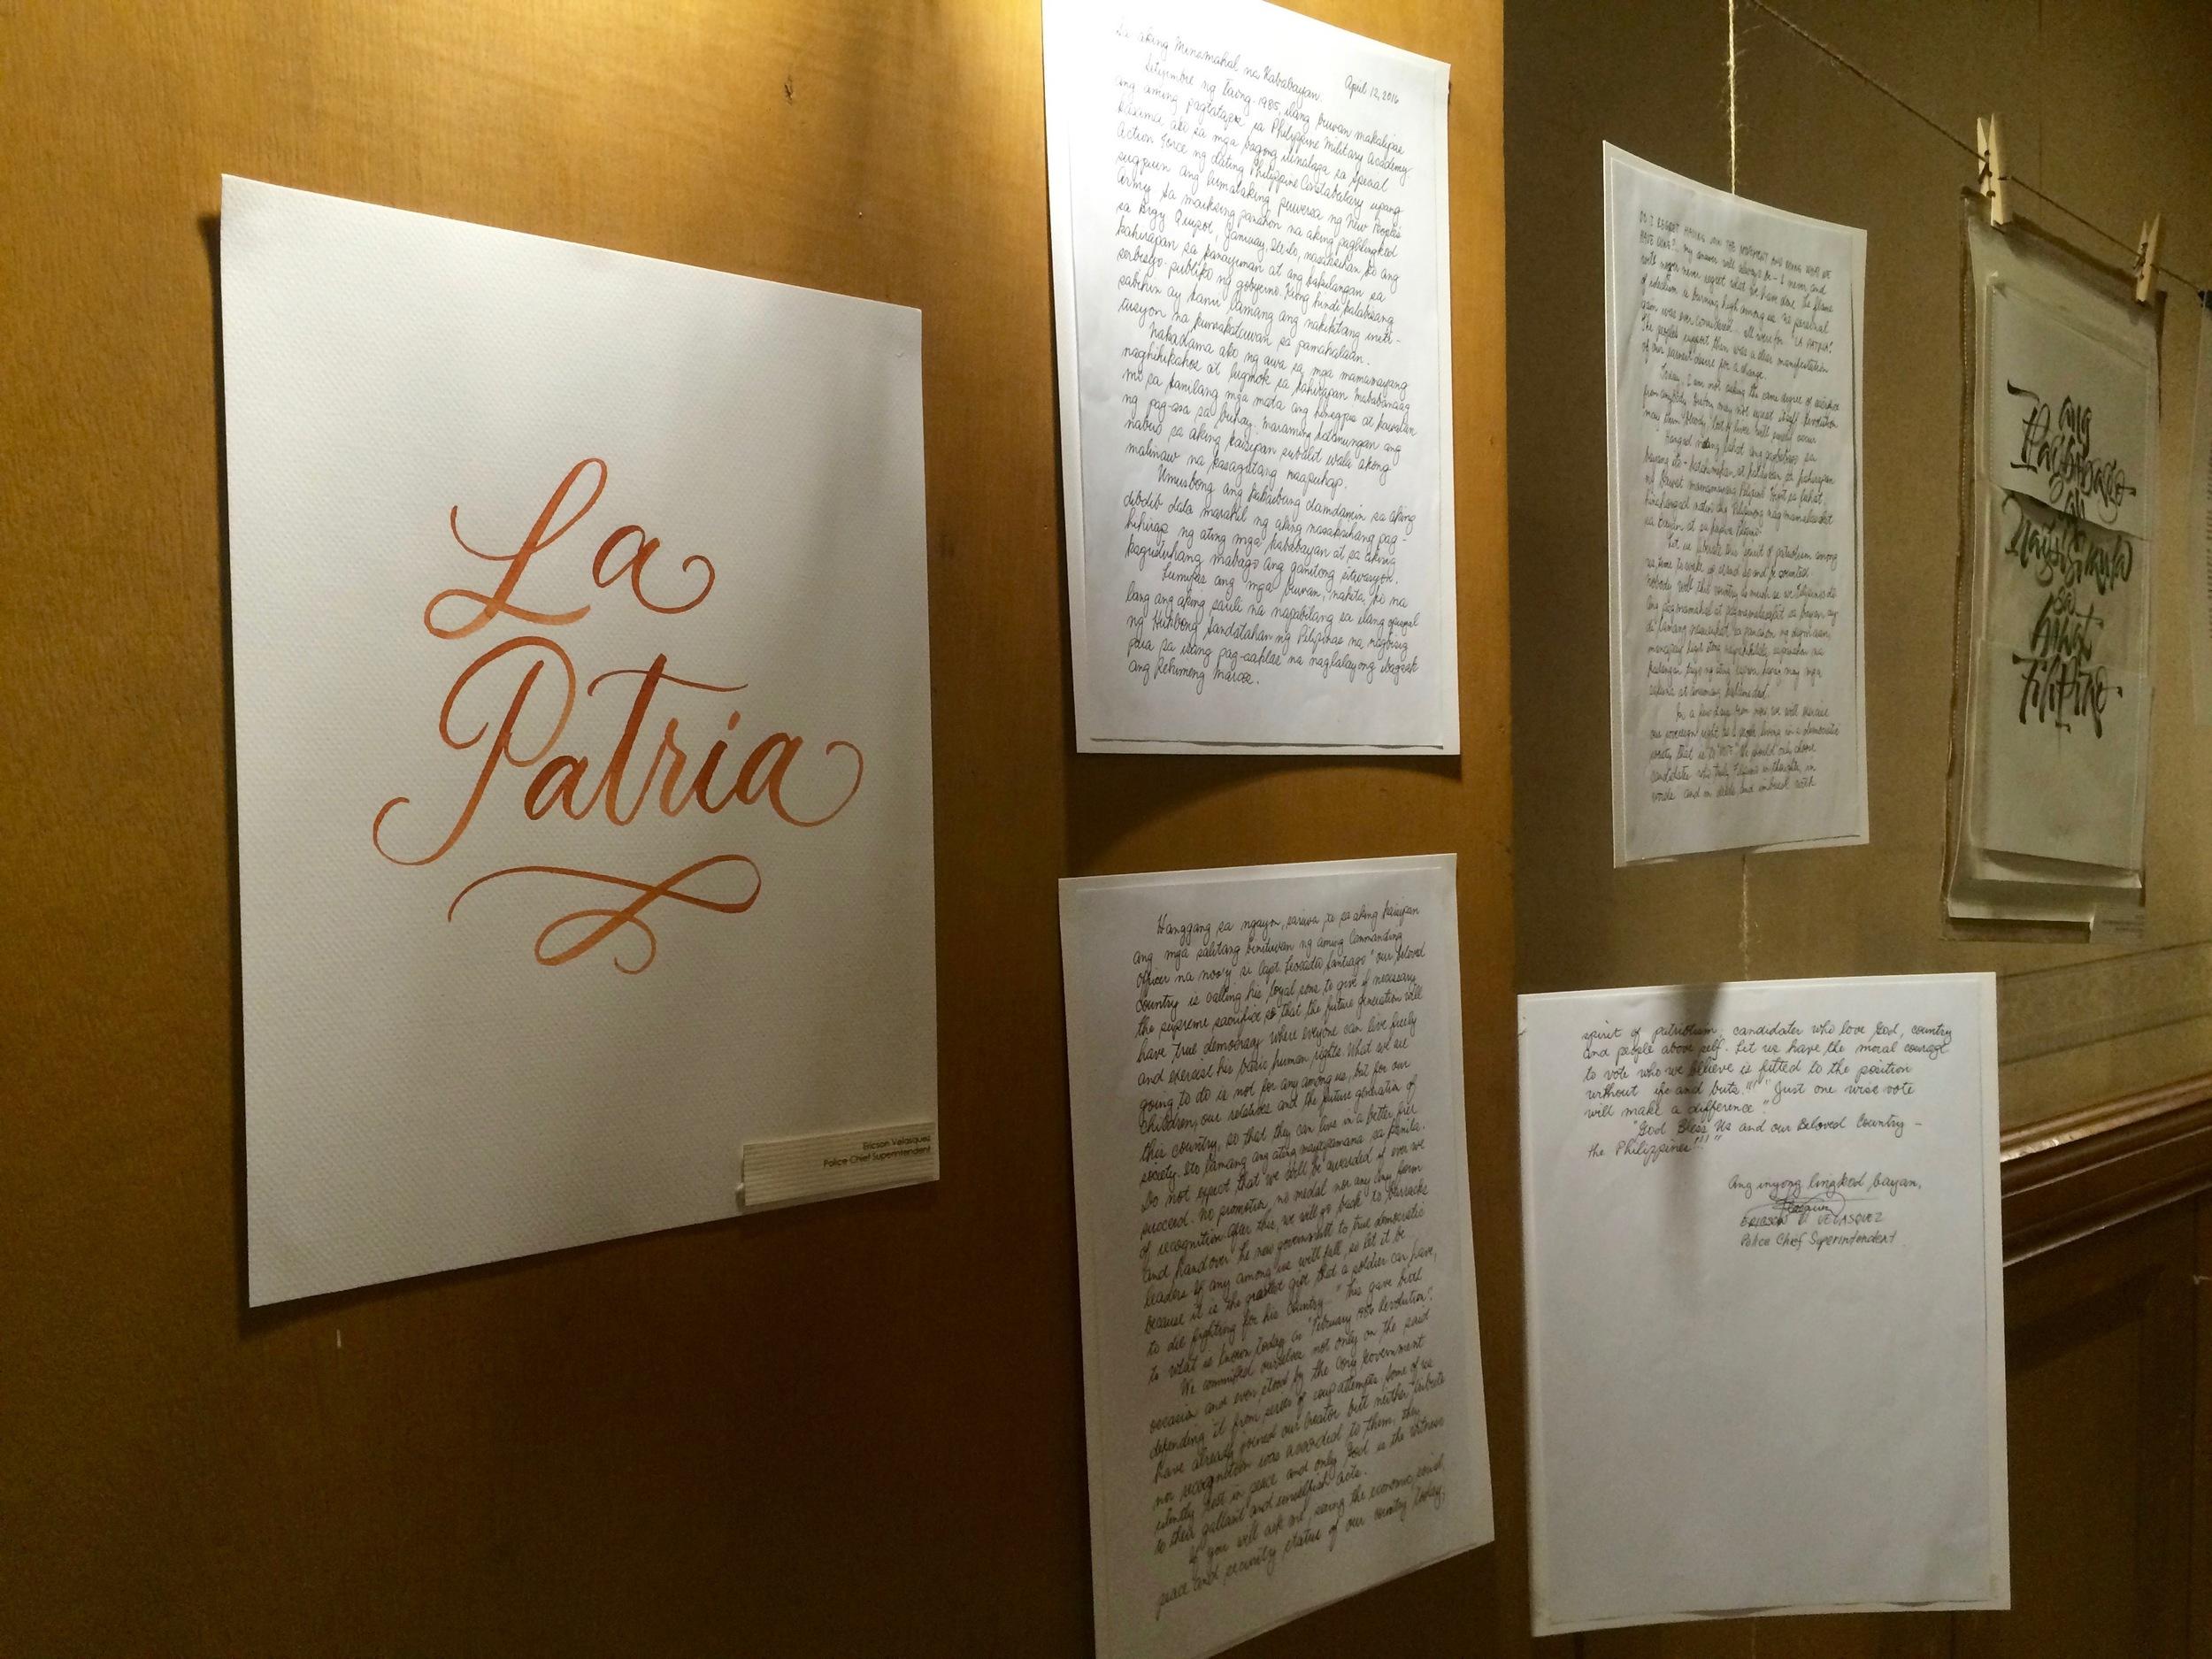 La Patria - Letter by Chief Police Superintendent Velasquez